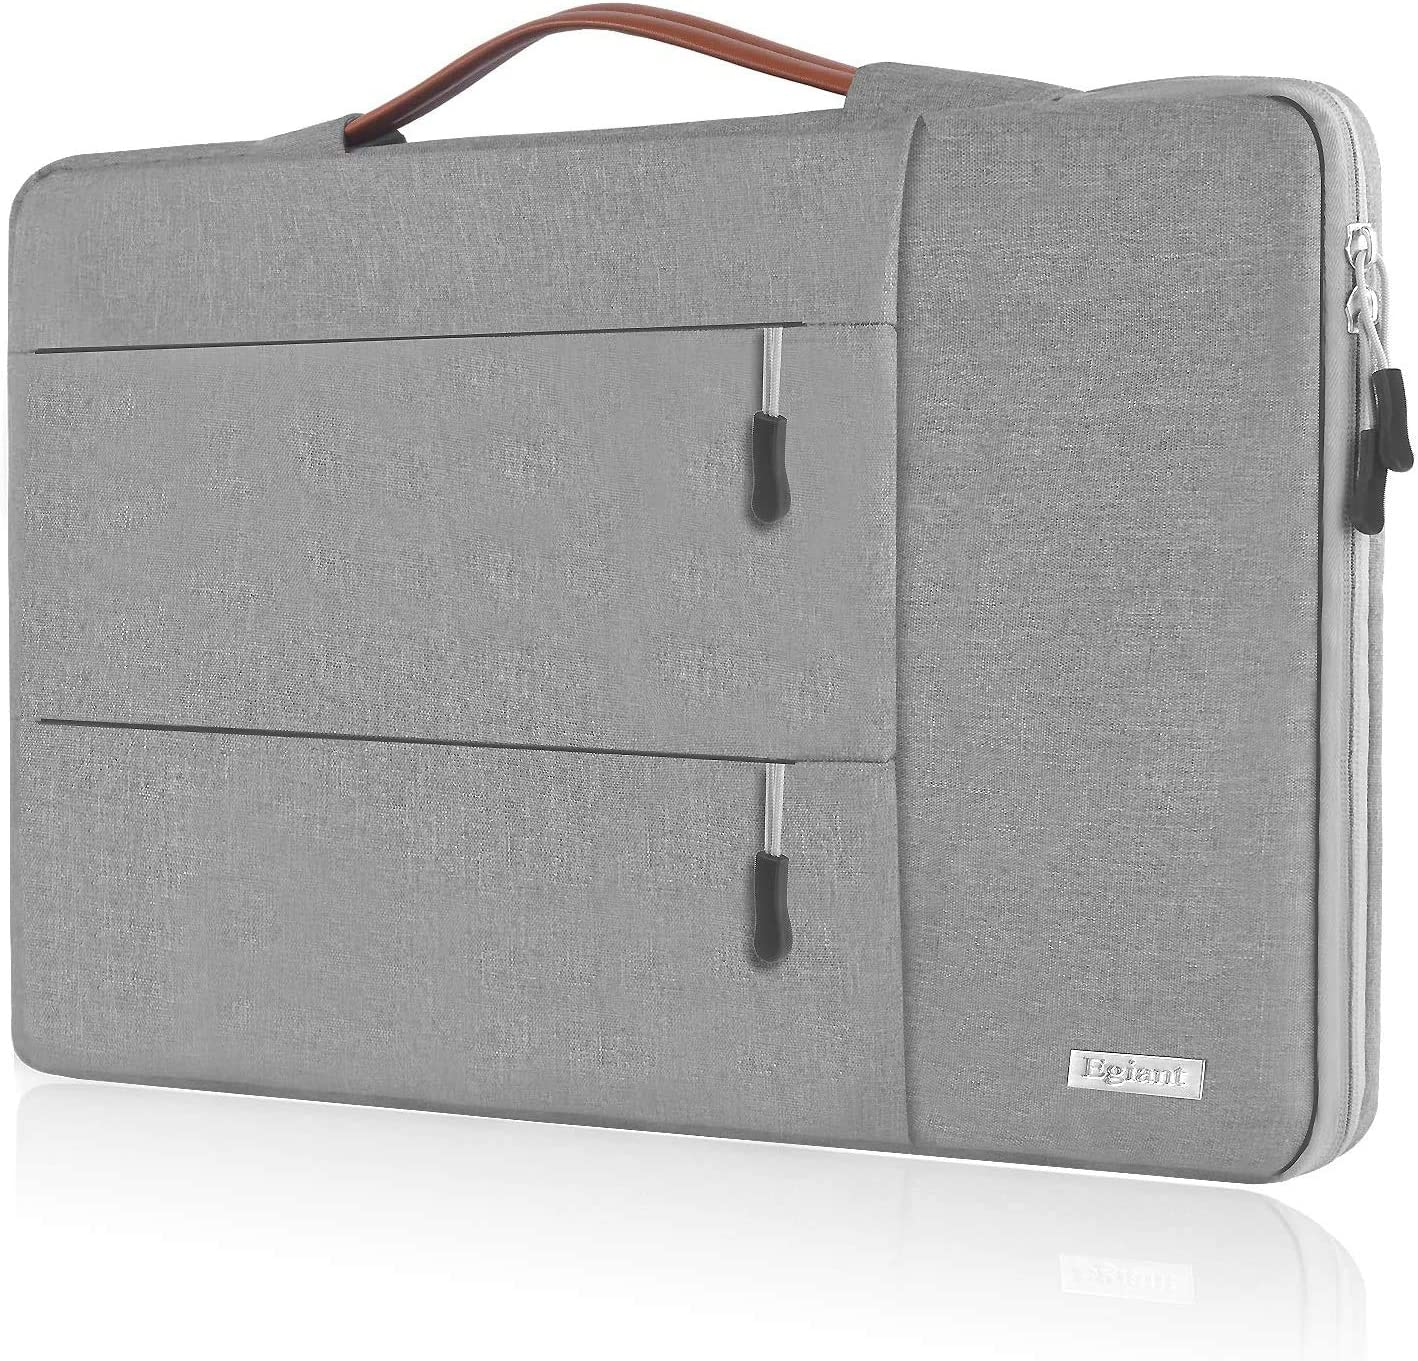 Egiant 14 inch Laptop Sleeve Case,360°Protective Handbag for HP Chromebook 14,Acer Spin 3/Aspire 1,Dell Inspiron 14/Latitude,Lenovo Flex 14,ASUS VivoBook Zenbook,Water-Resistant Notebook Bag, Gray